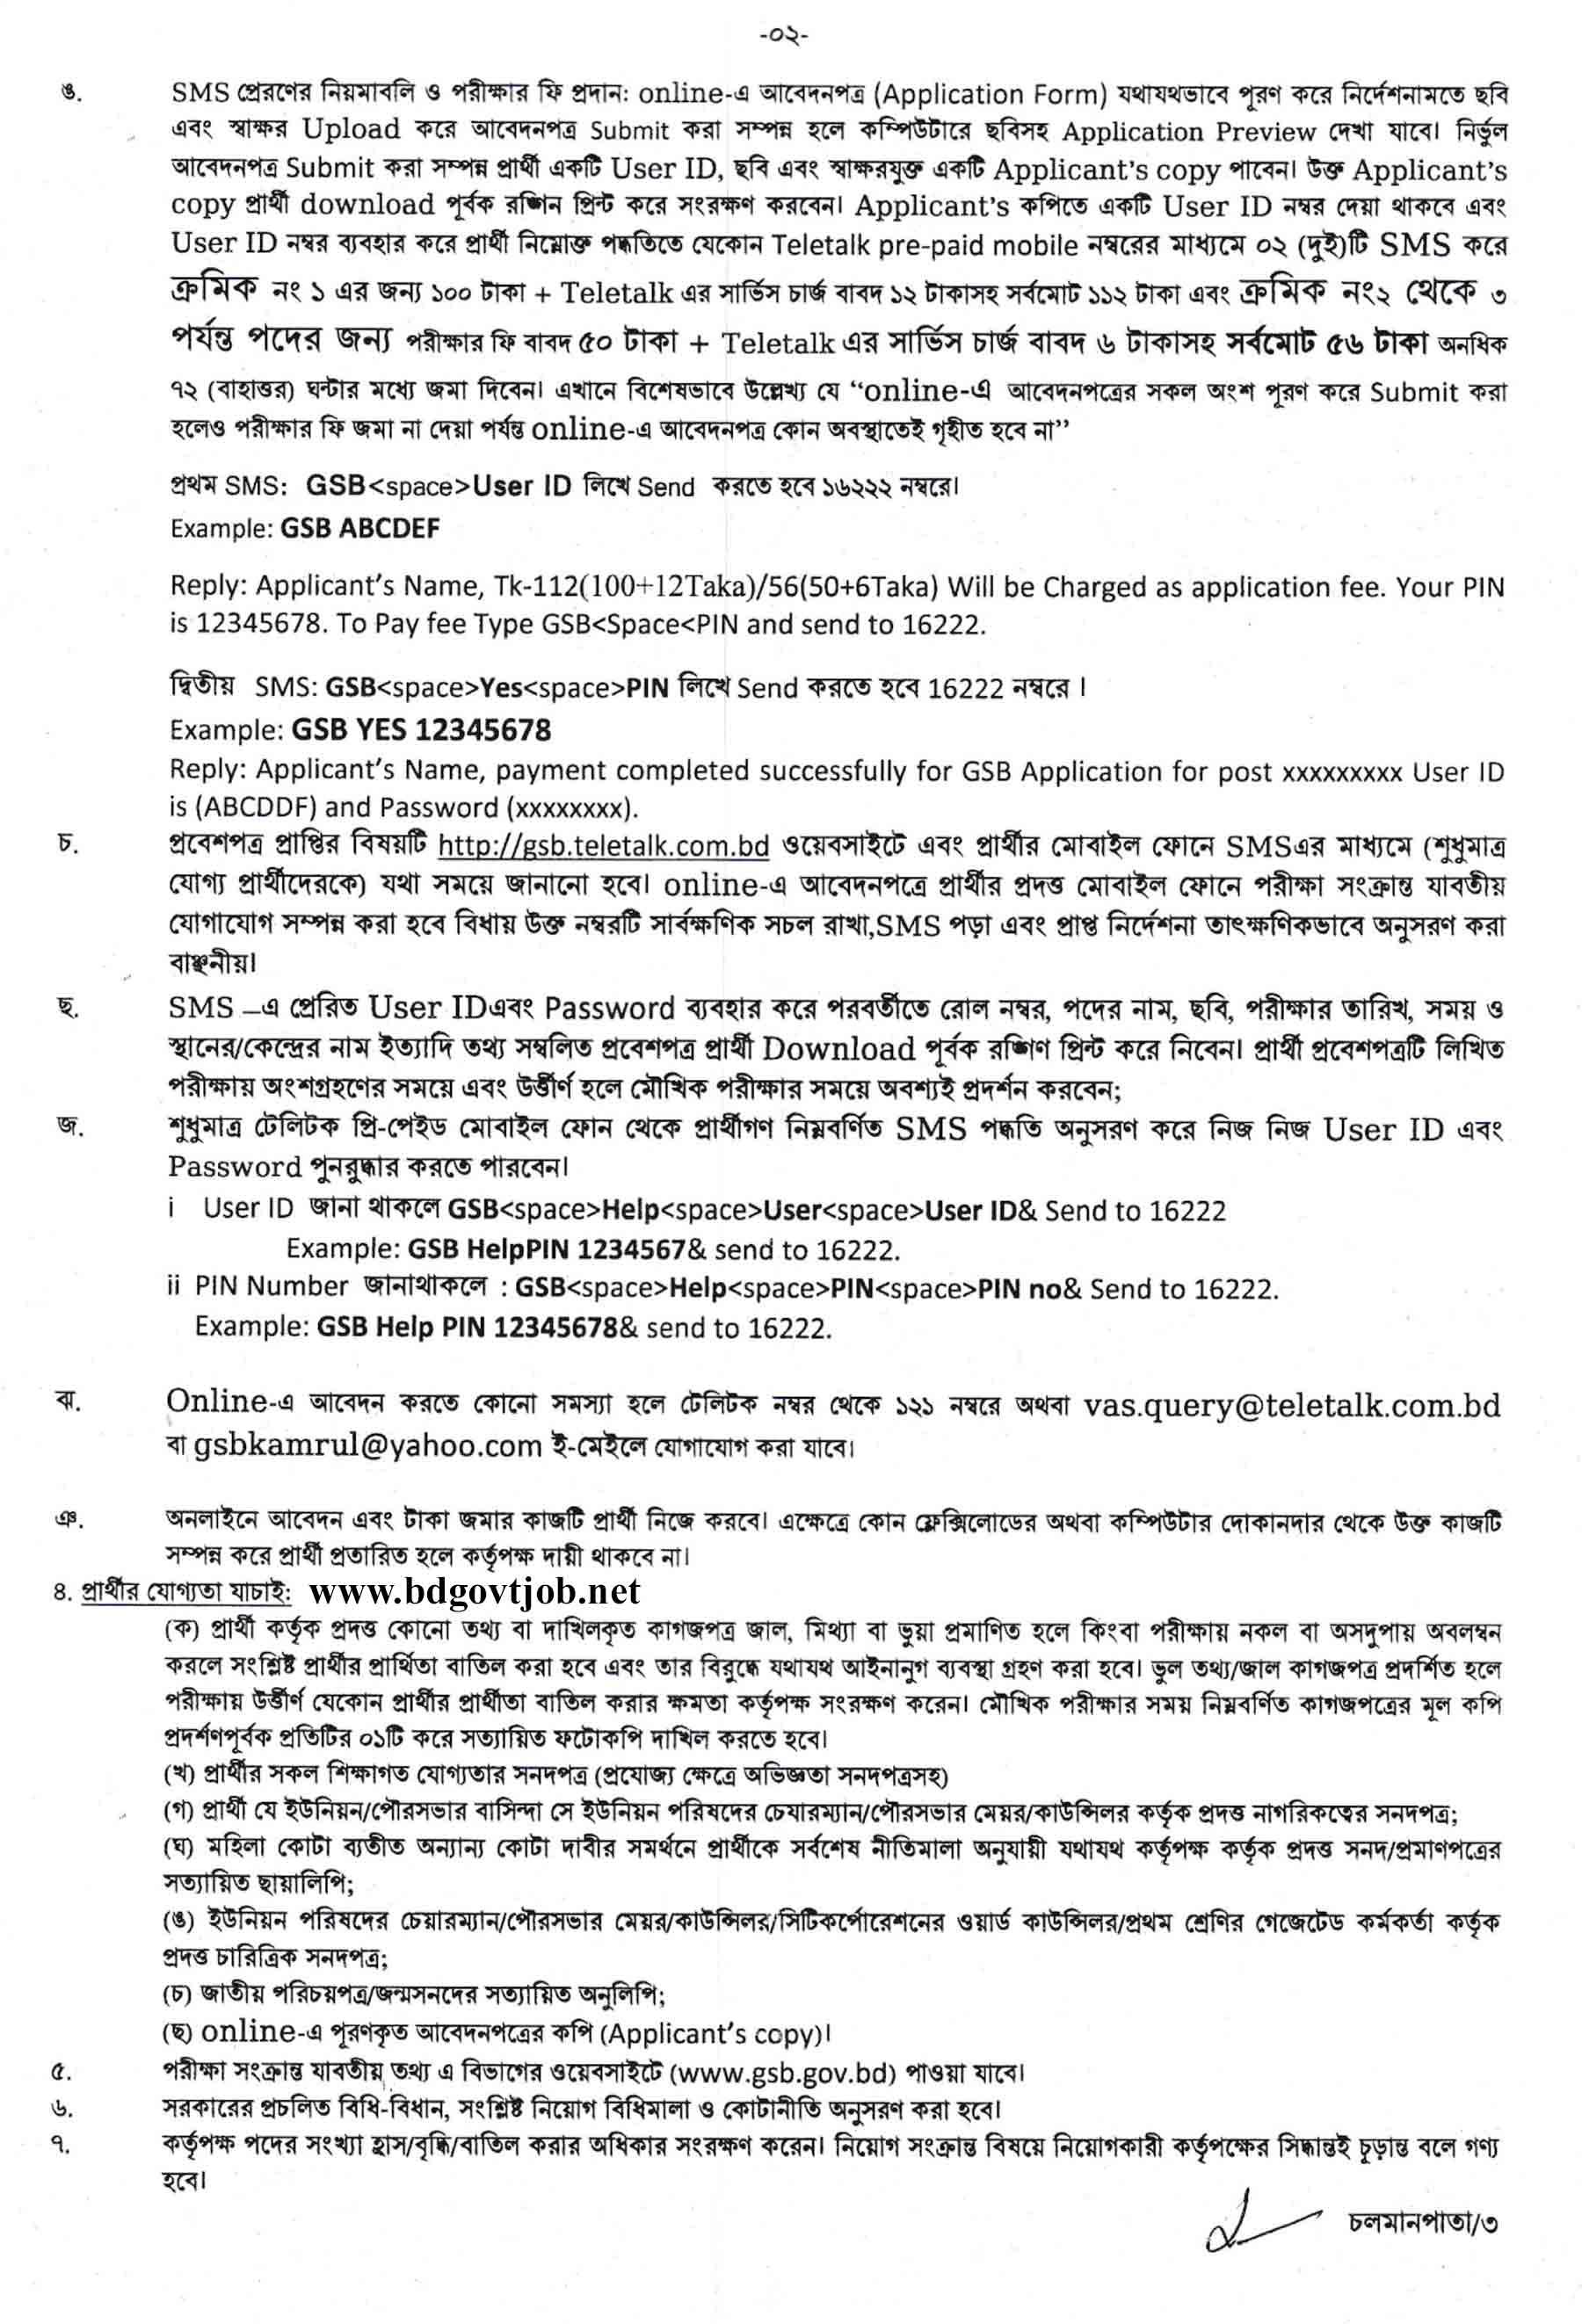 Geological Survey of Bangladesh Job Circular 2021